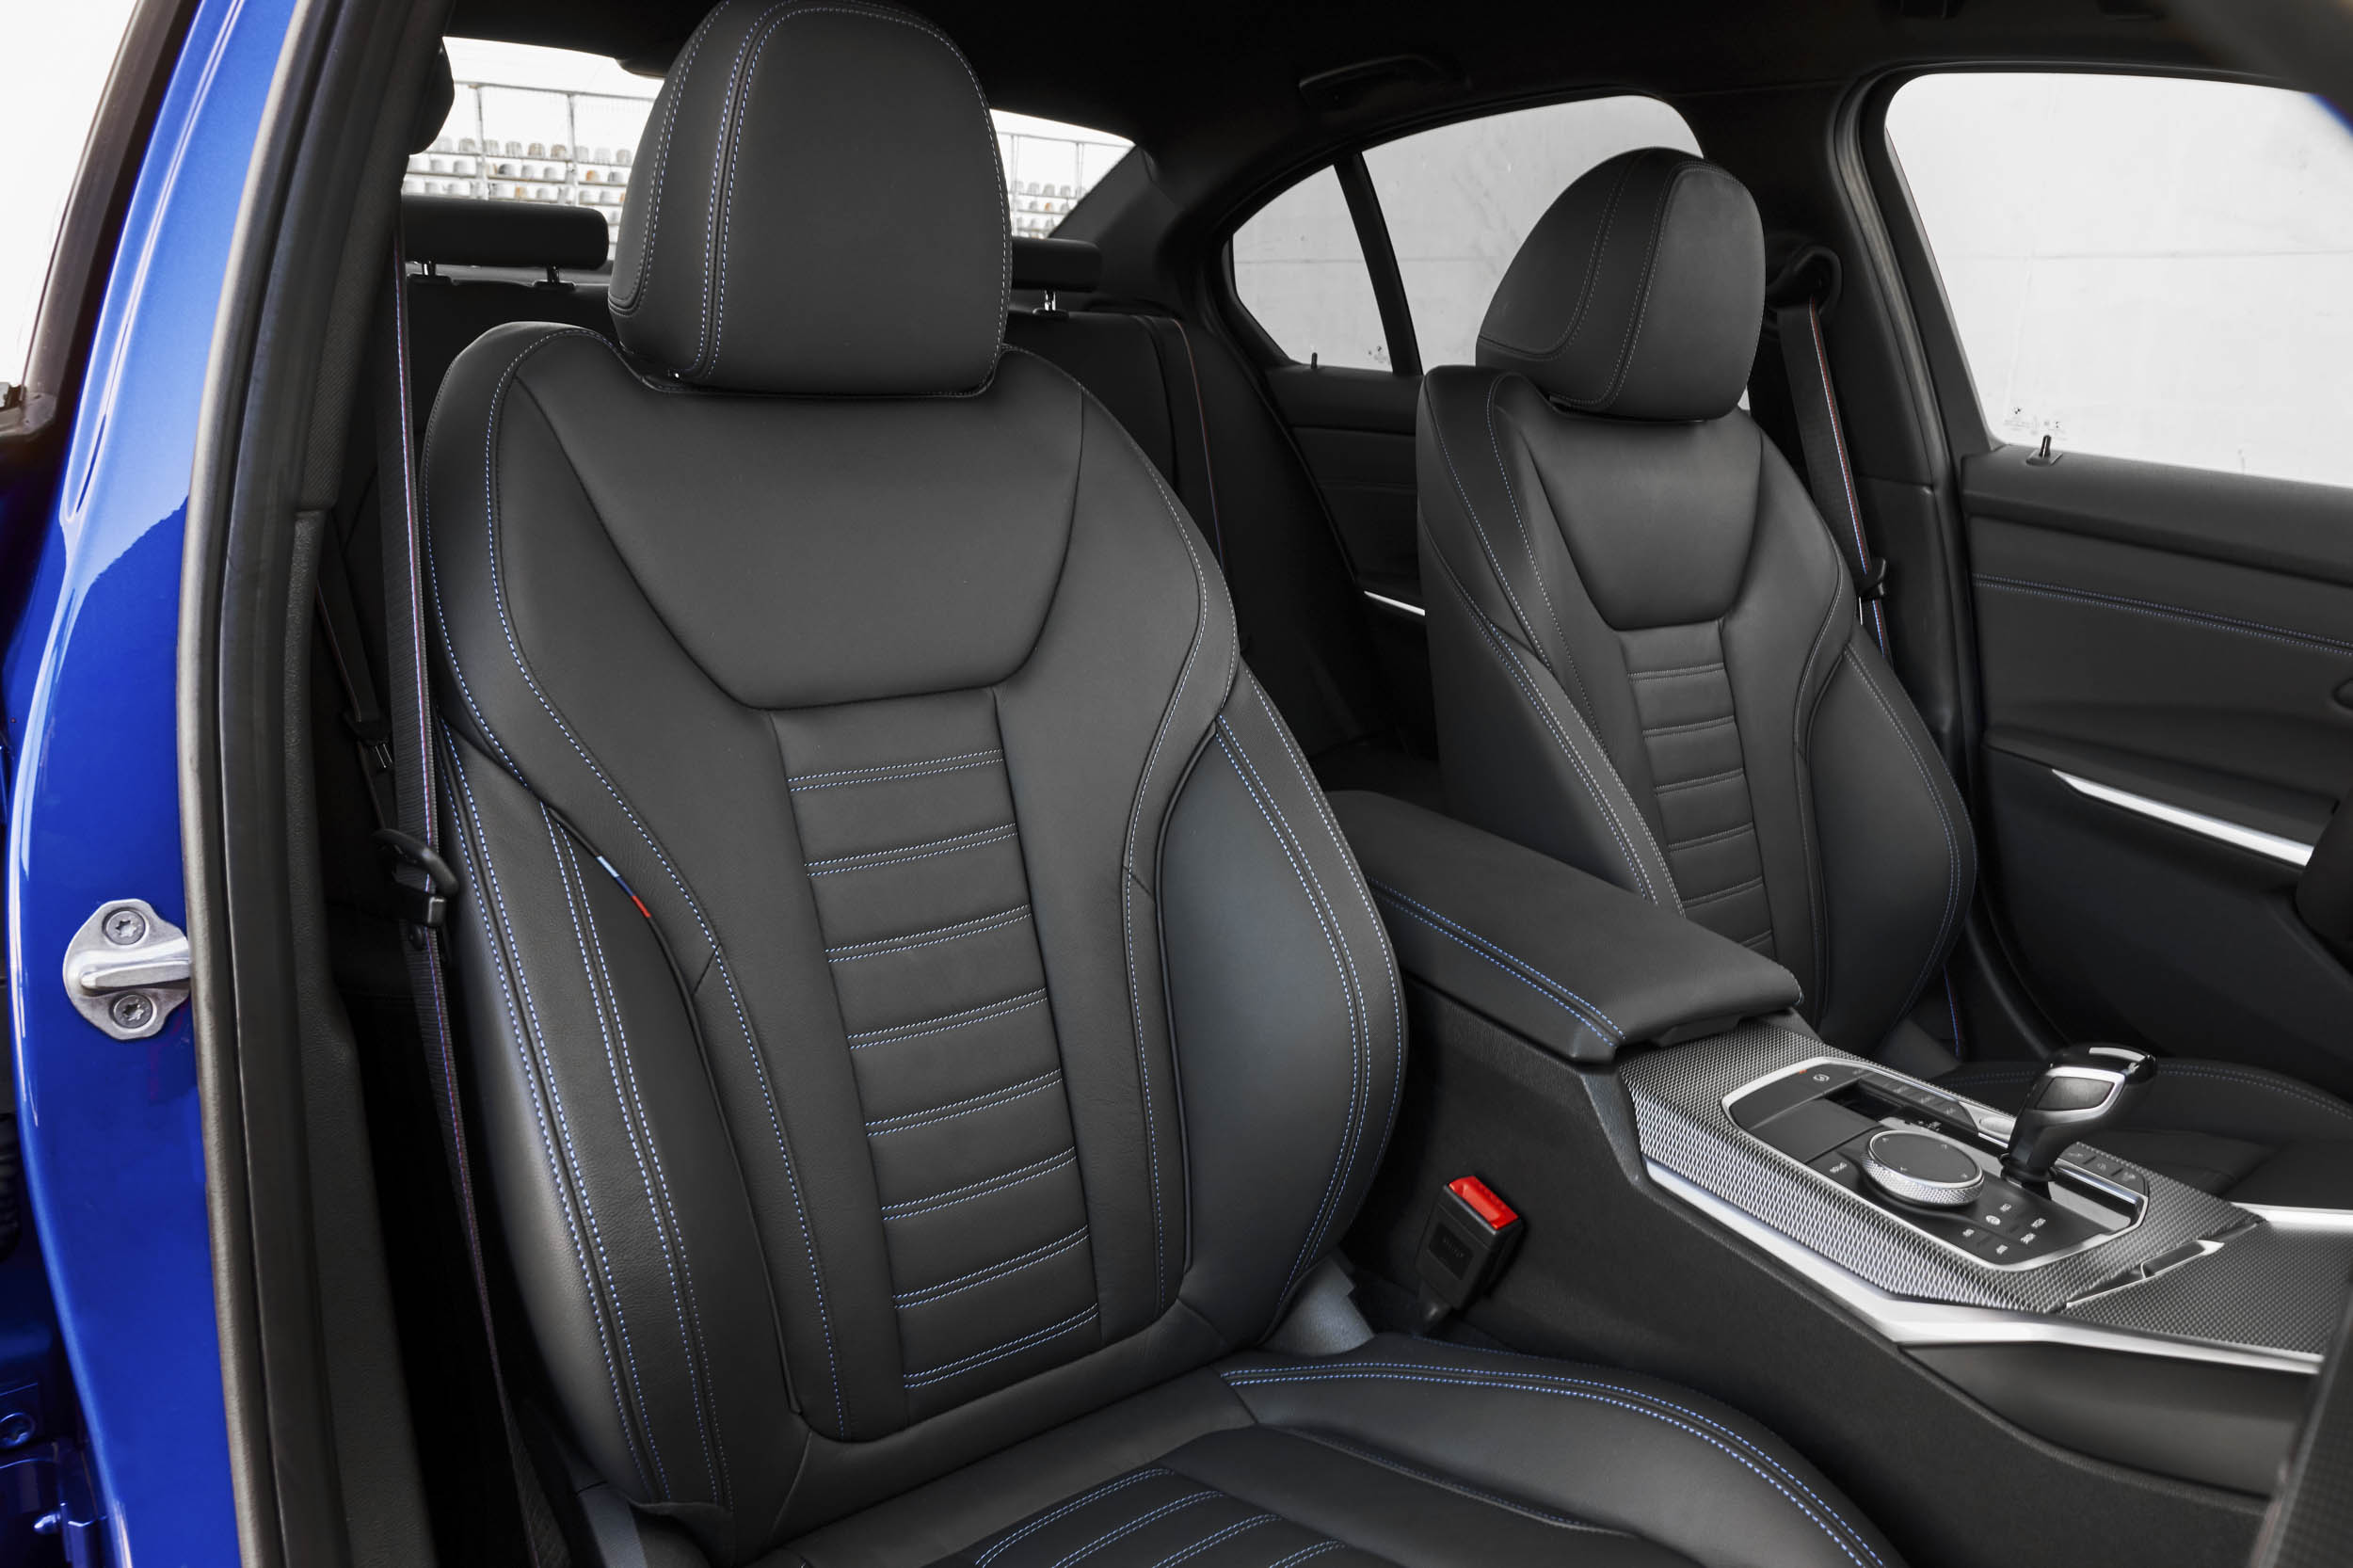 2019 BMW 330i M Sport passenger seat